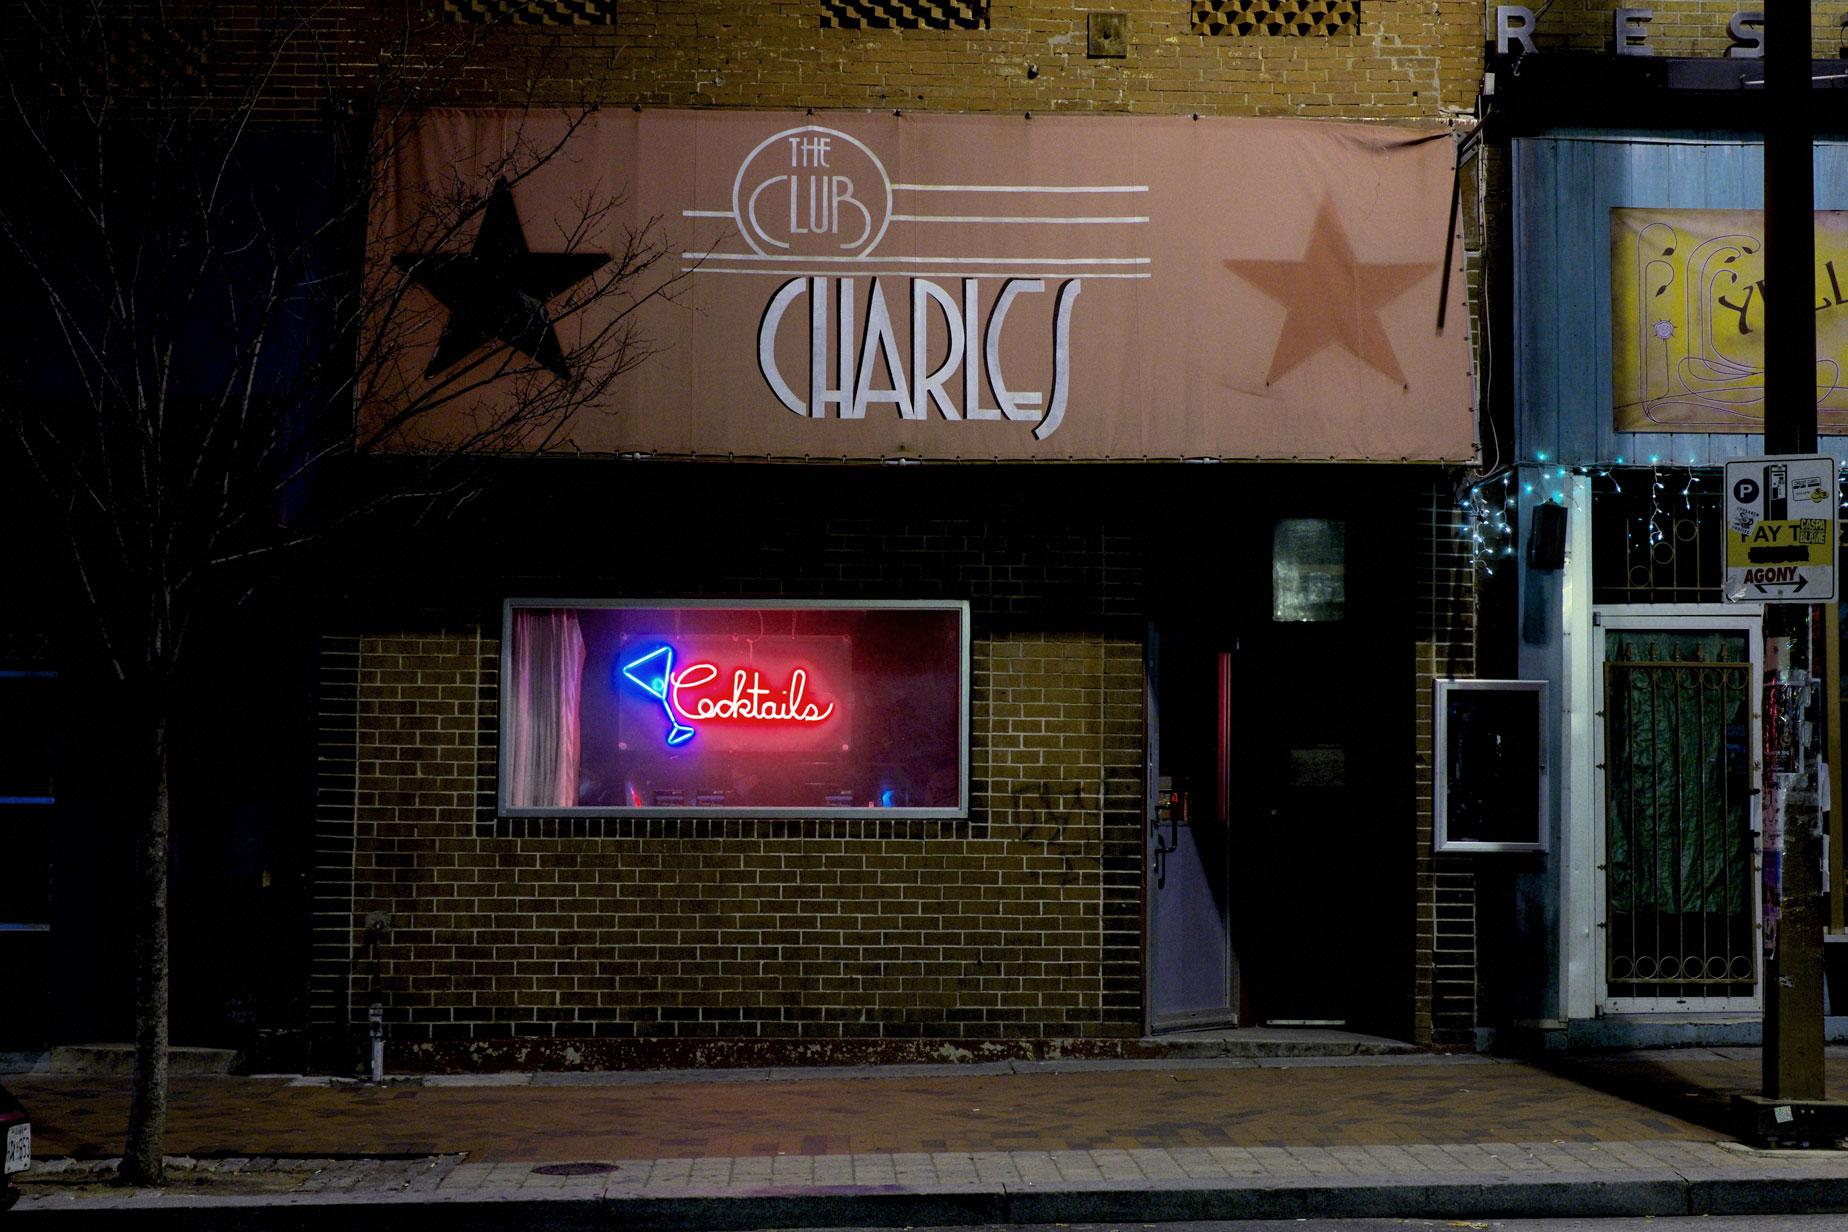 The Club Charles